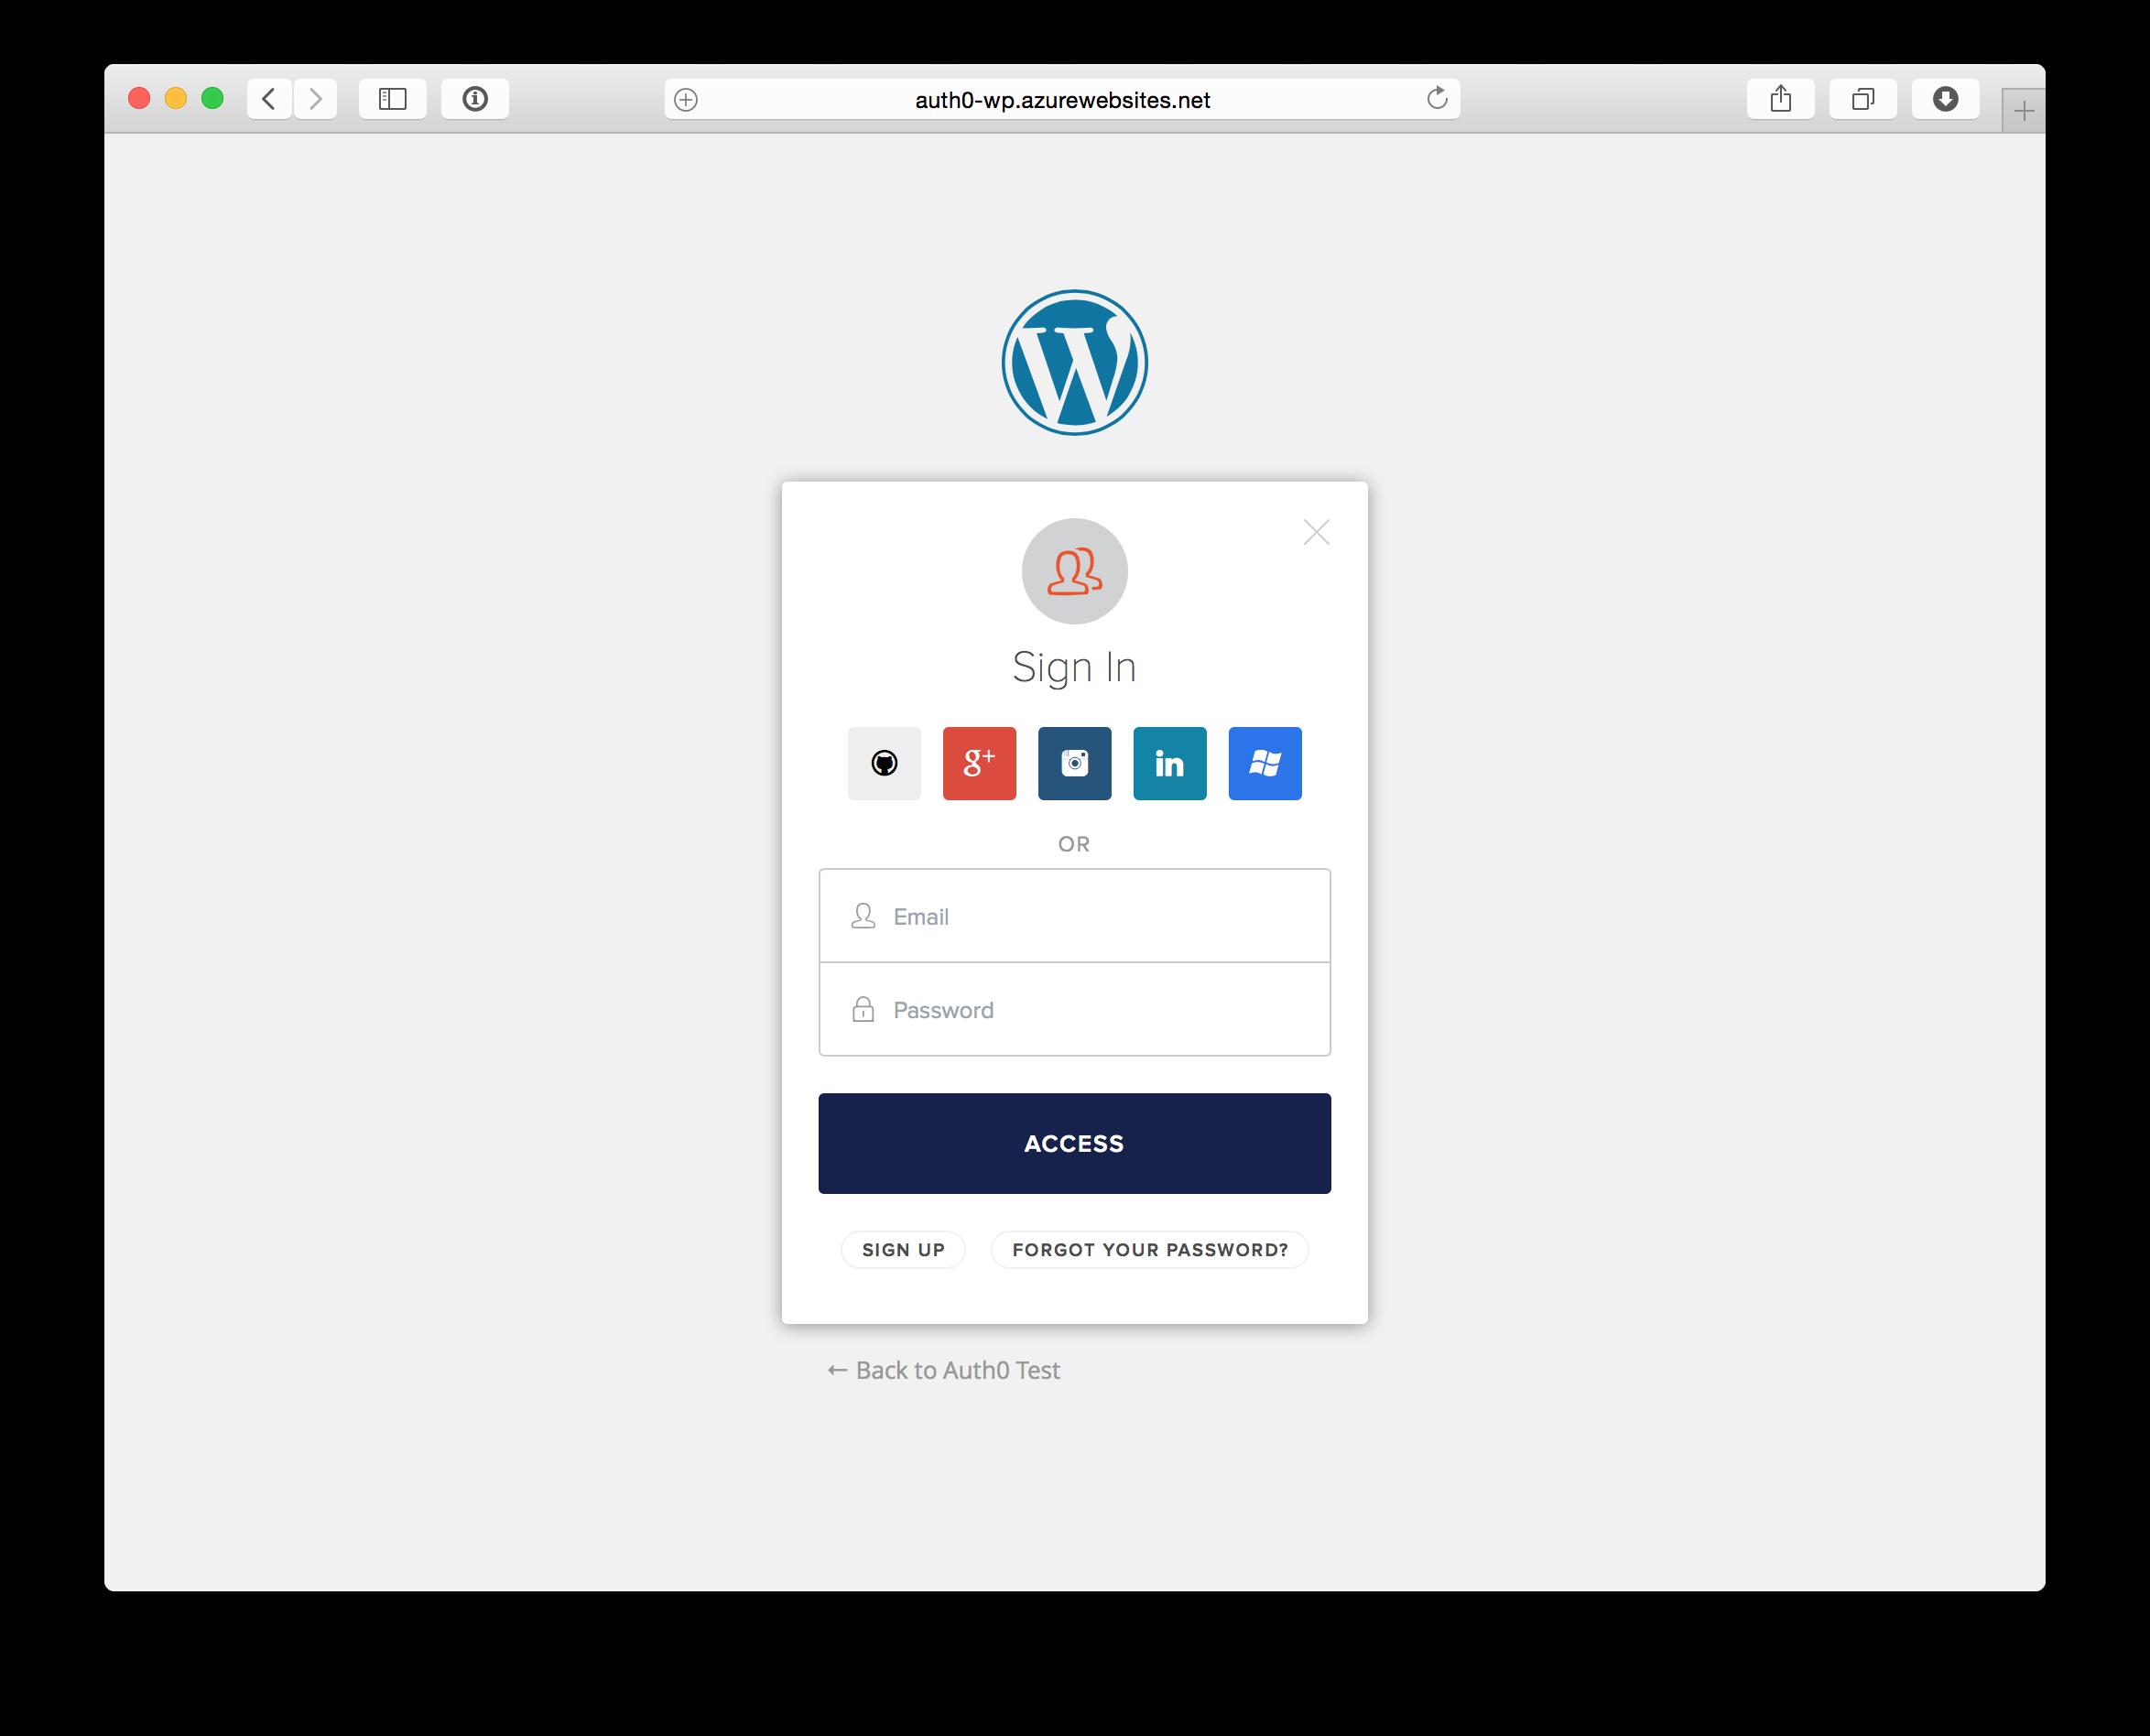 Log into a Wordpress site using social login provider